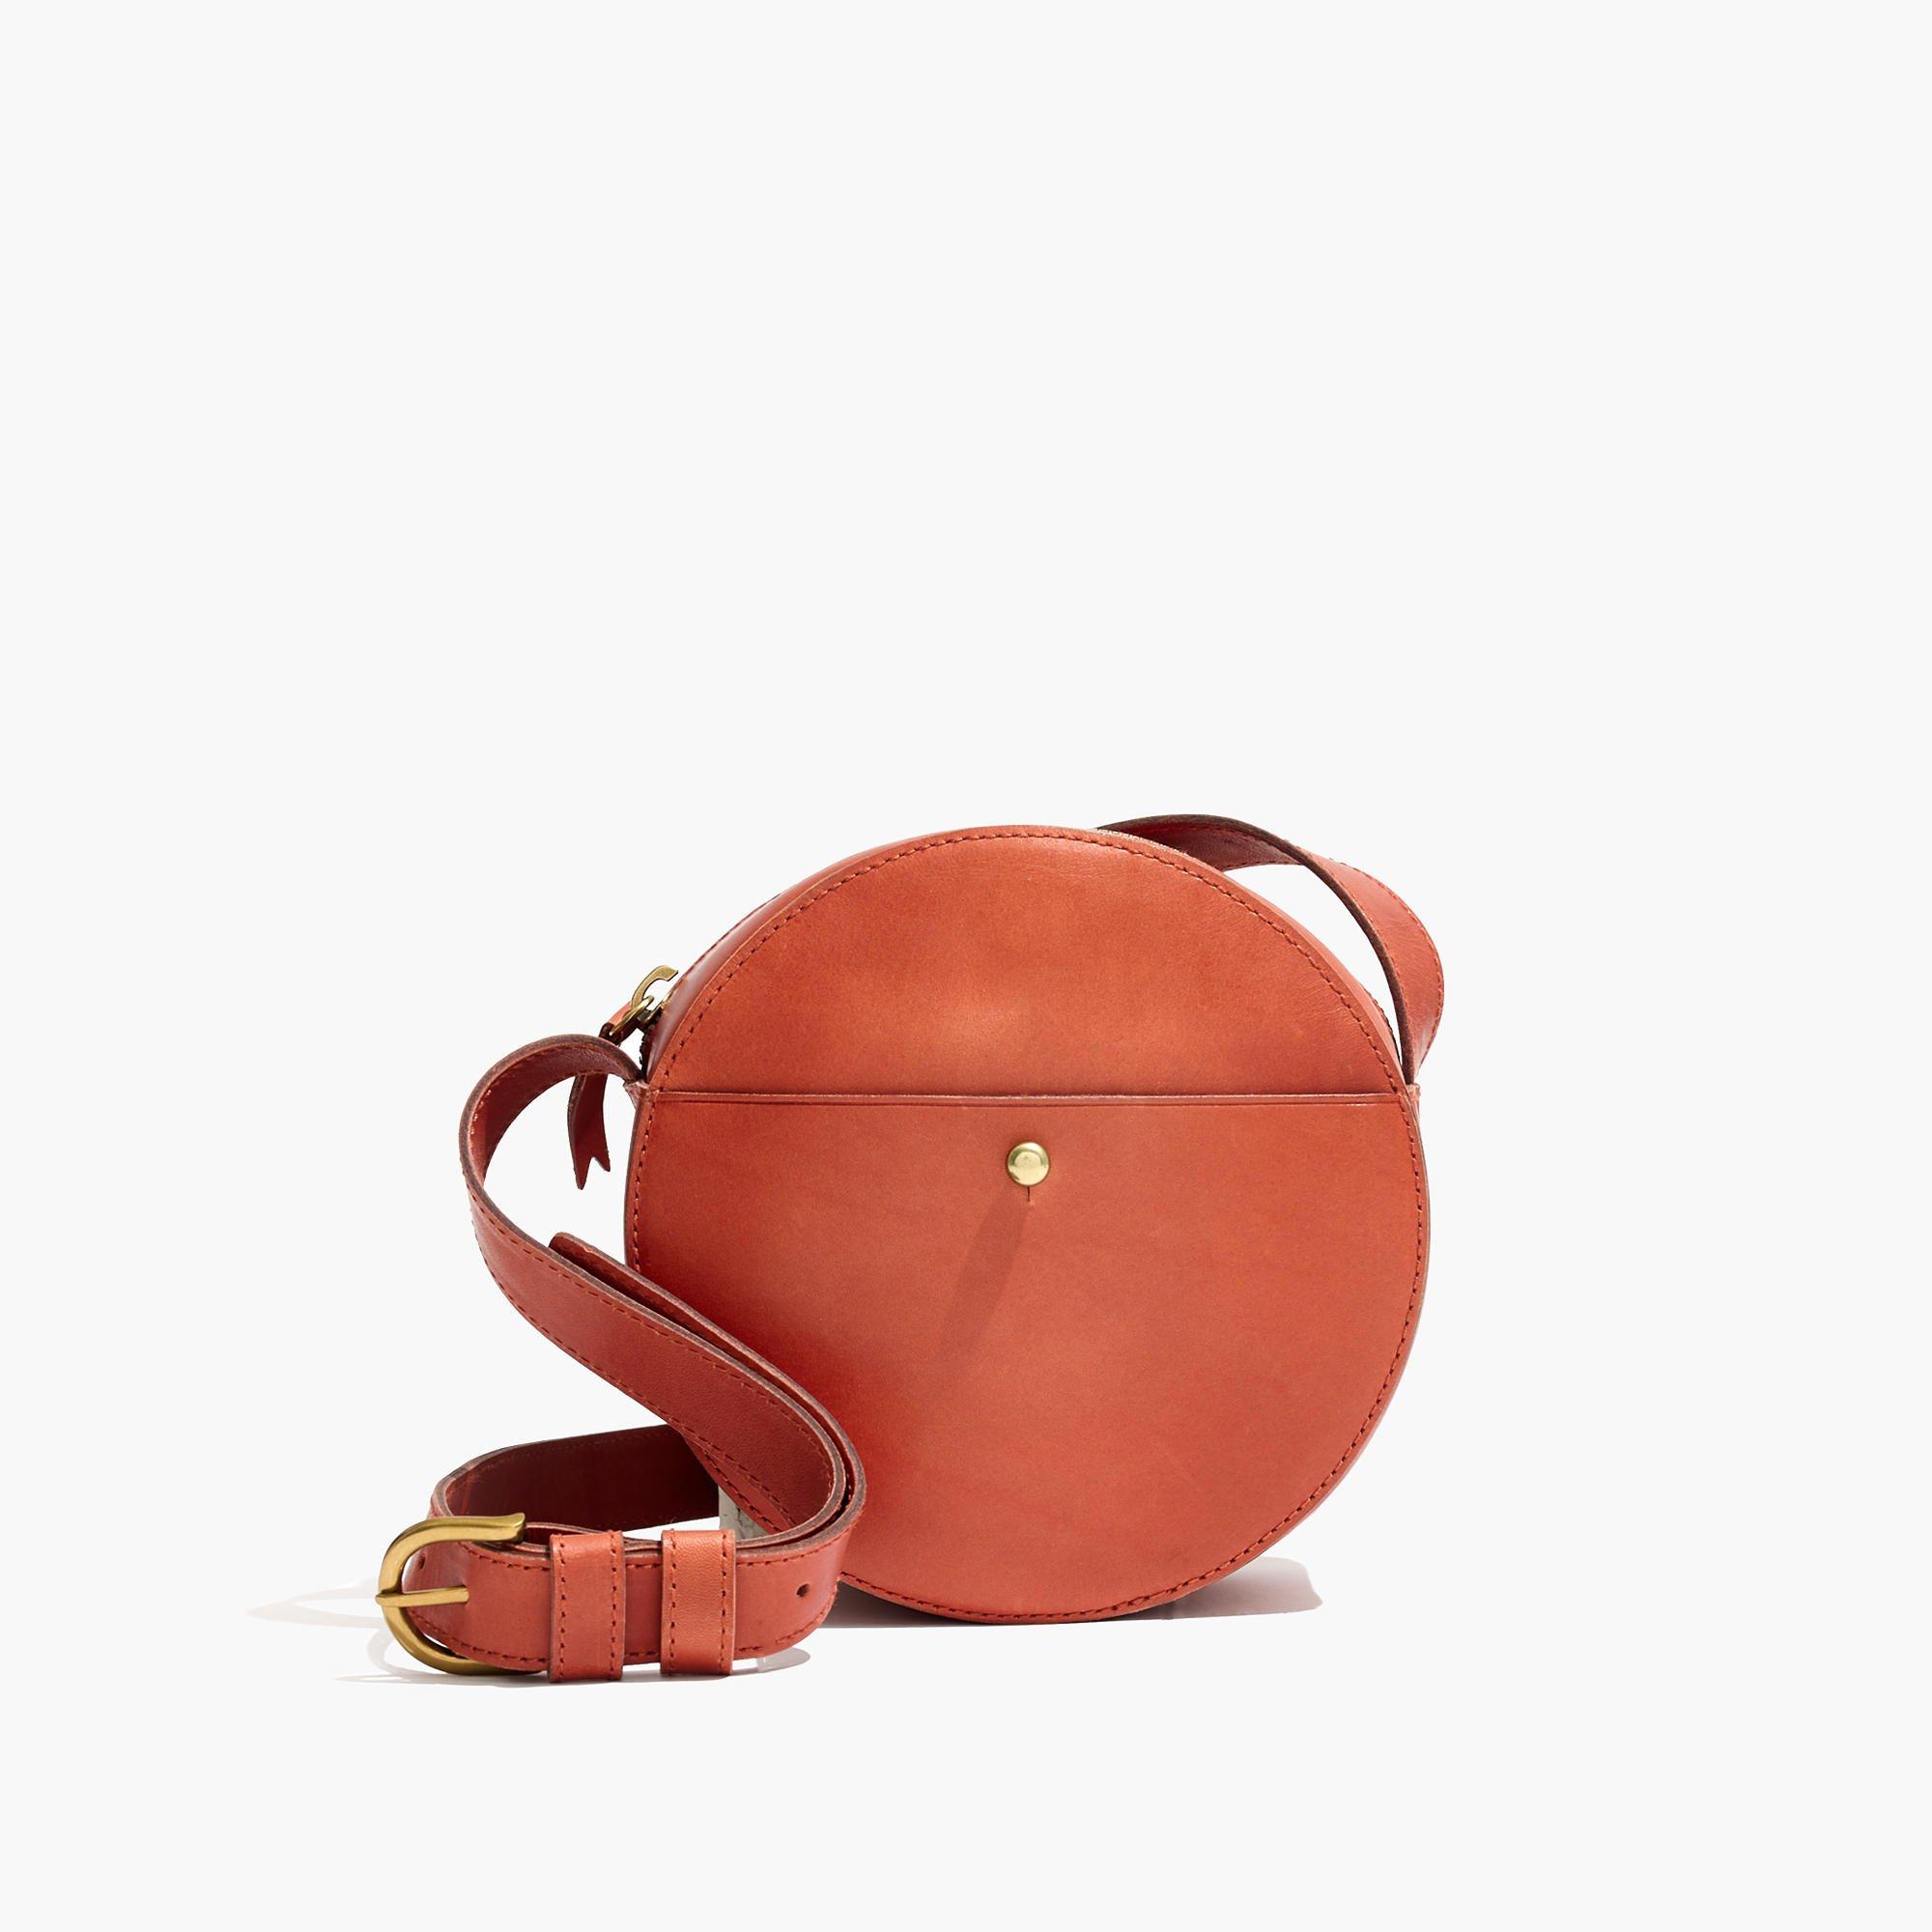 a08b93e63896c Neva Opet crossbody mini circle bag from Queen for Dinner